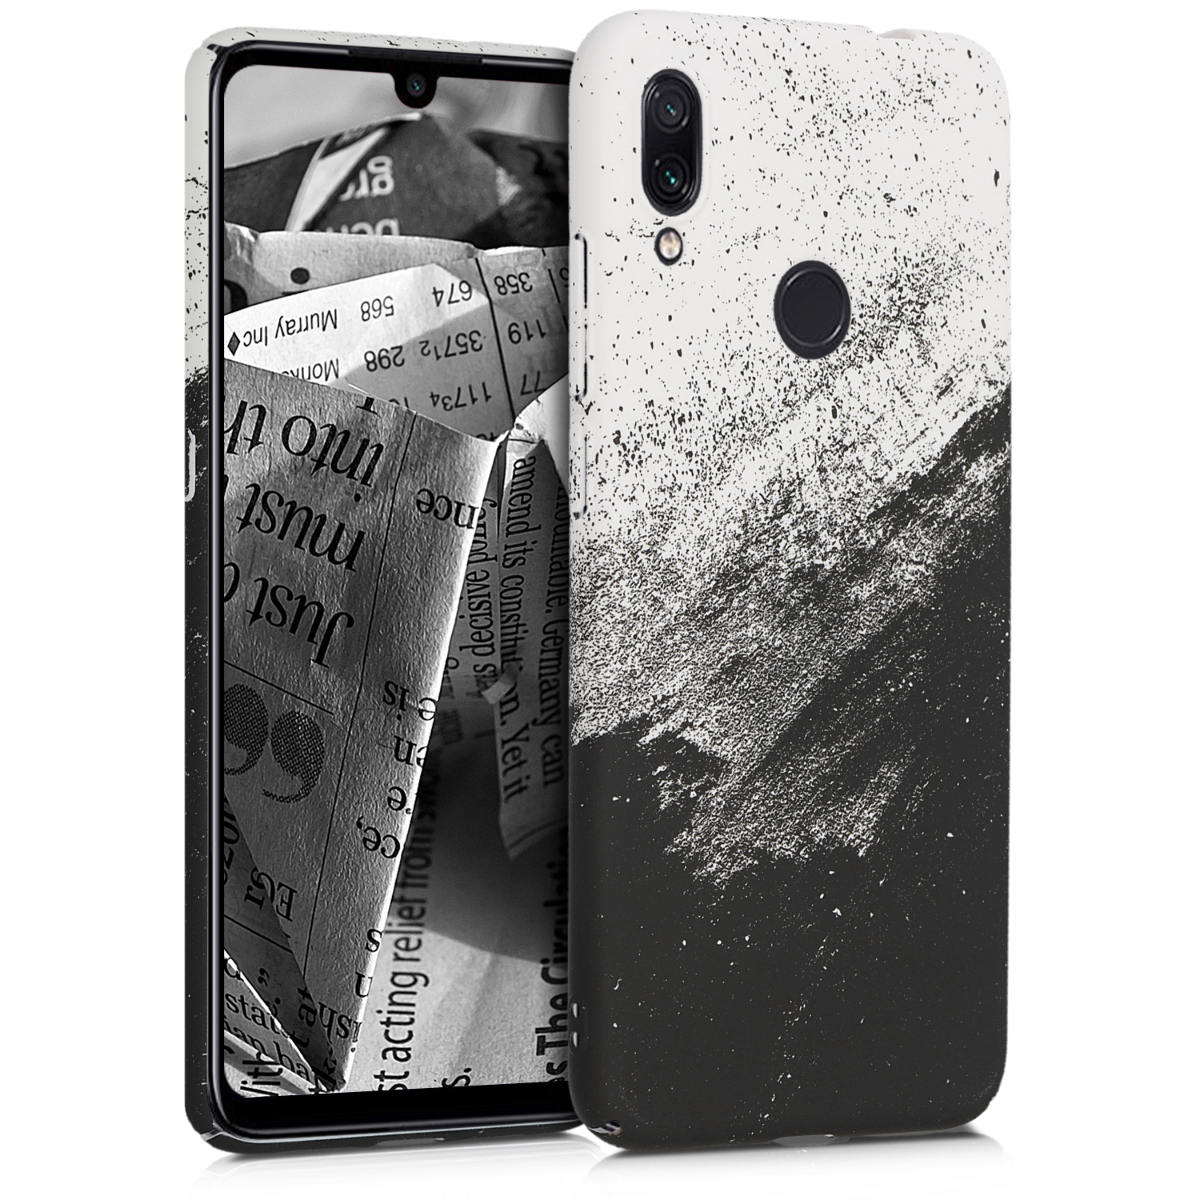 KW Σκληρή Θήκη Xiaomi Redmi Note 7 / Note 7 Pro - Black / White (49022.01)